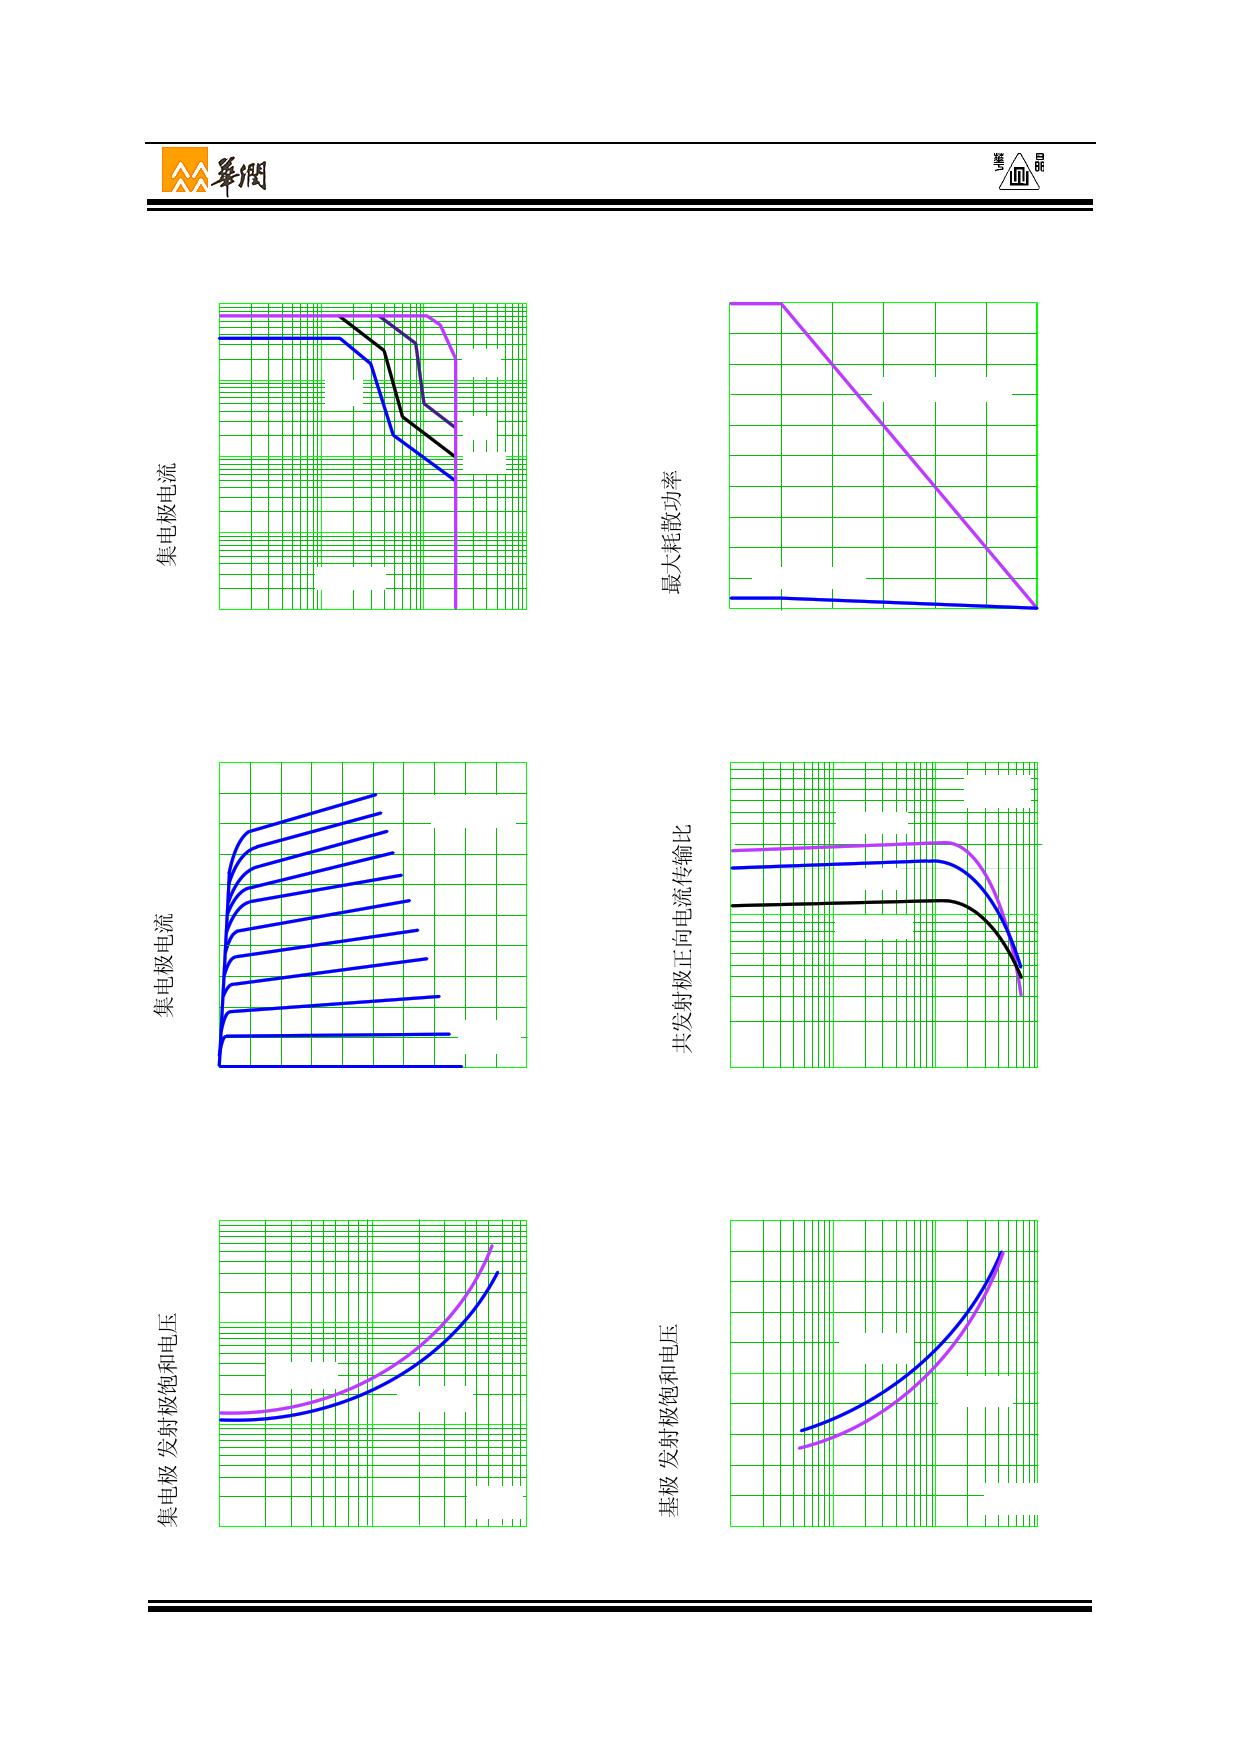 3DD128FH6D pdf, ピン配列